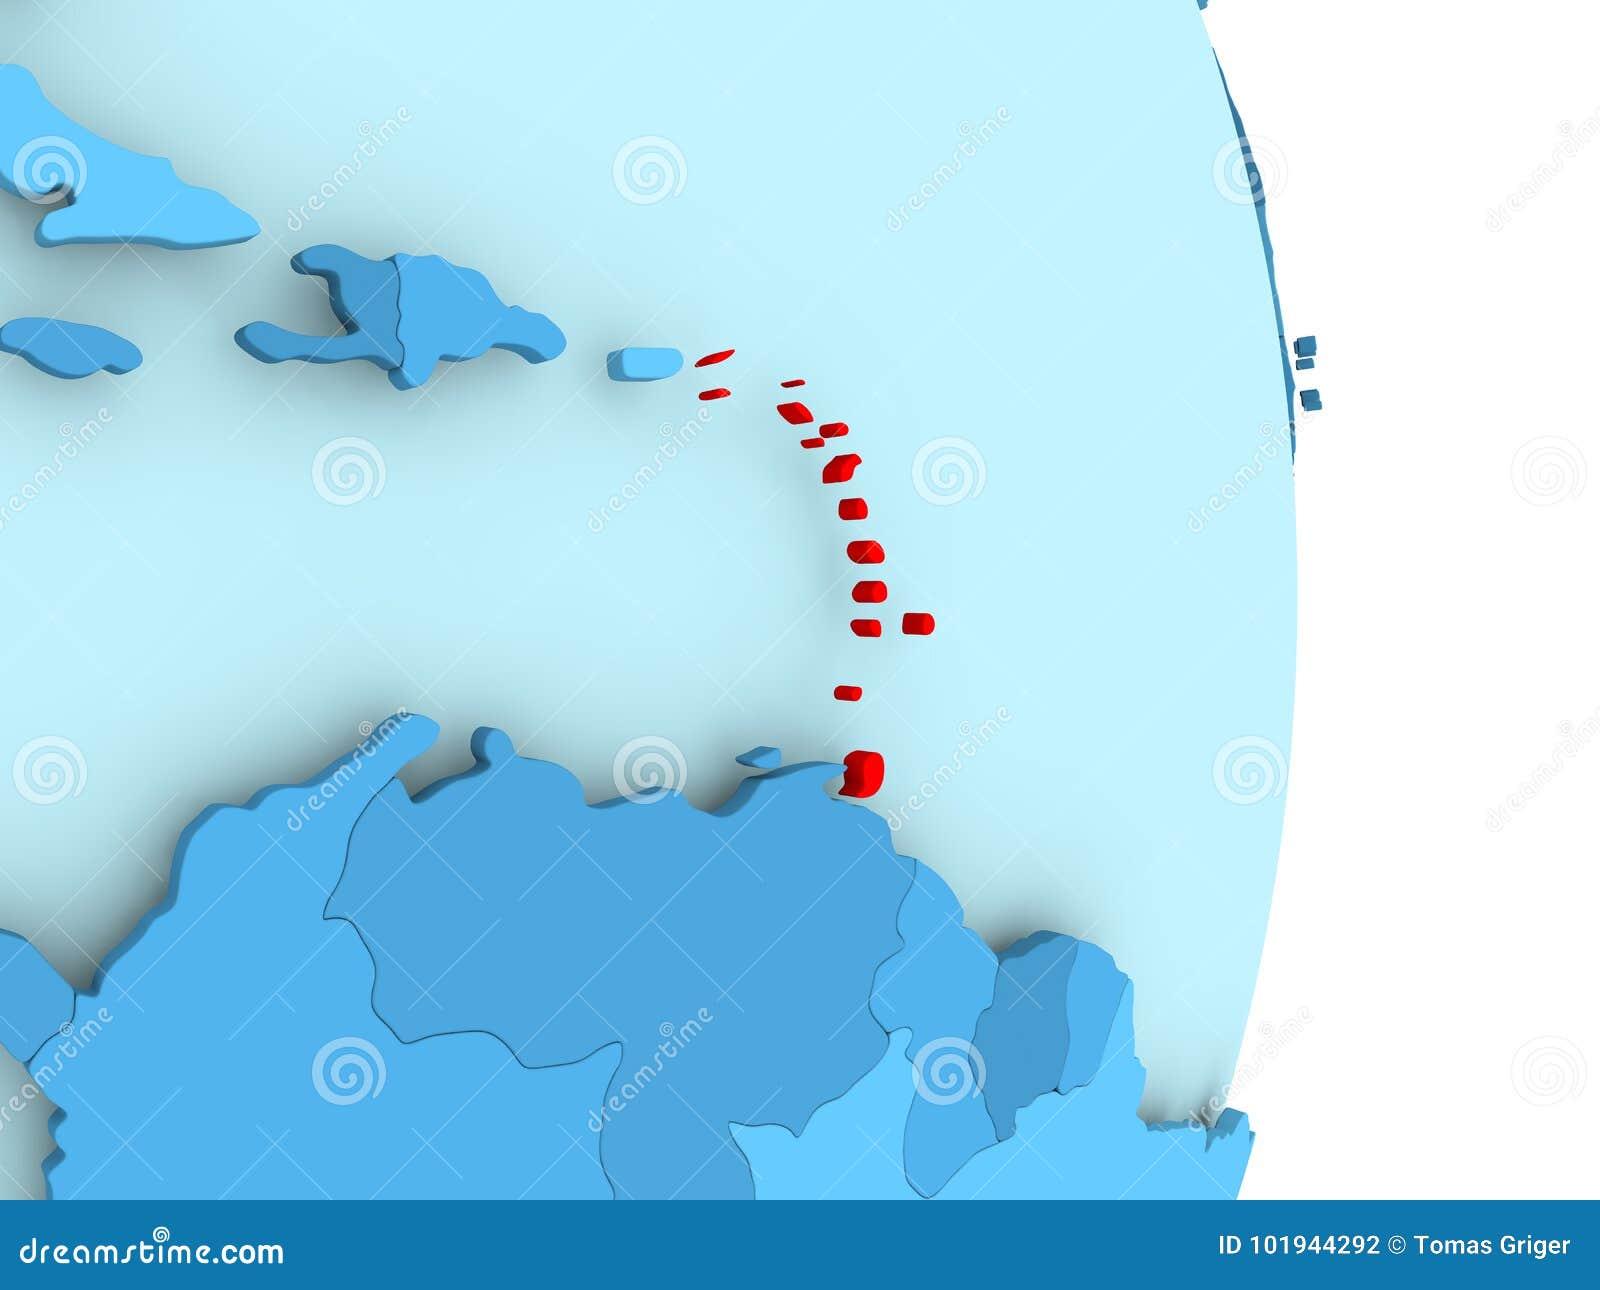 Map of Caribbean in red stock illustration. Illustration of globe ...